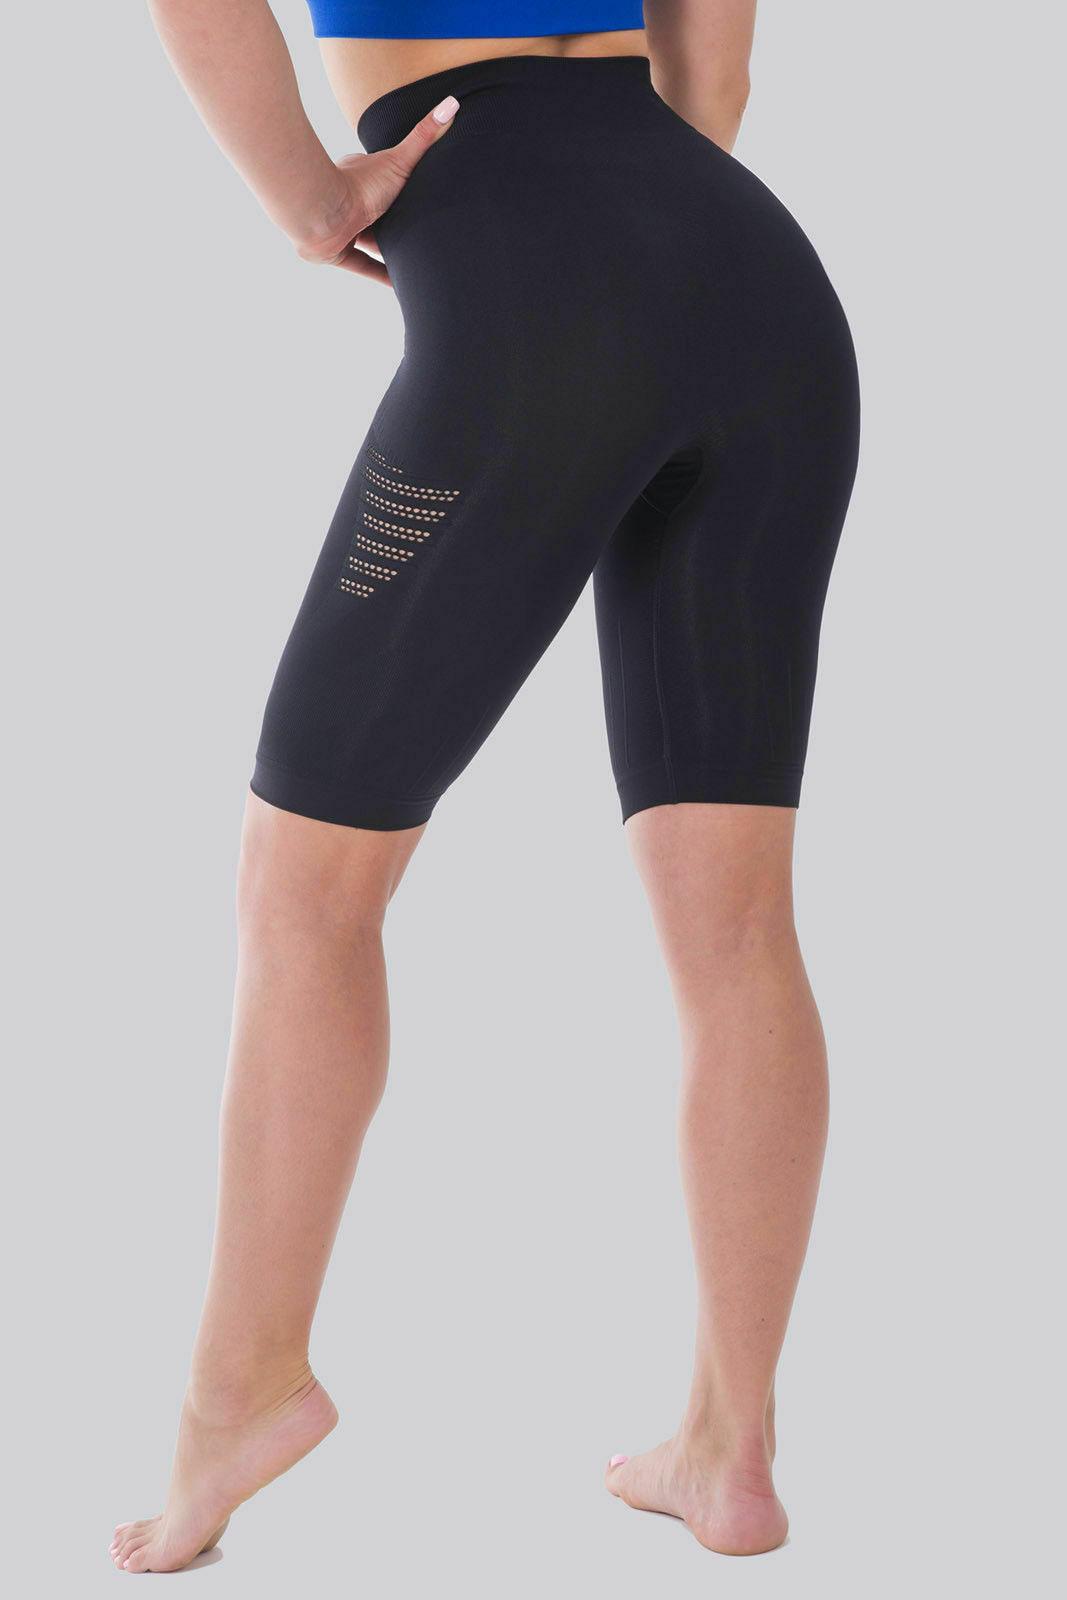 Bellissima-Women-039-s-Compression-Sport-Yoga-Shorts-High-Waist-Workout-Running thumbnail 23